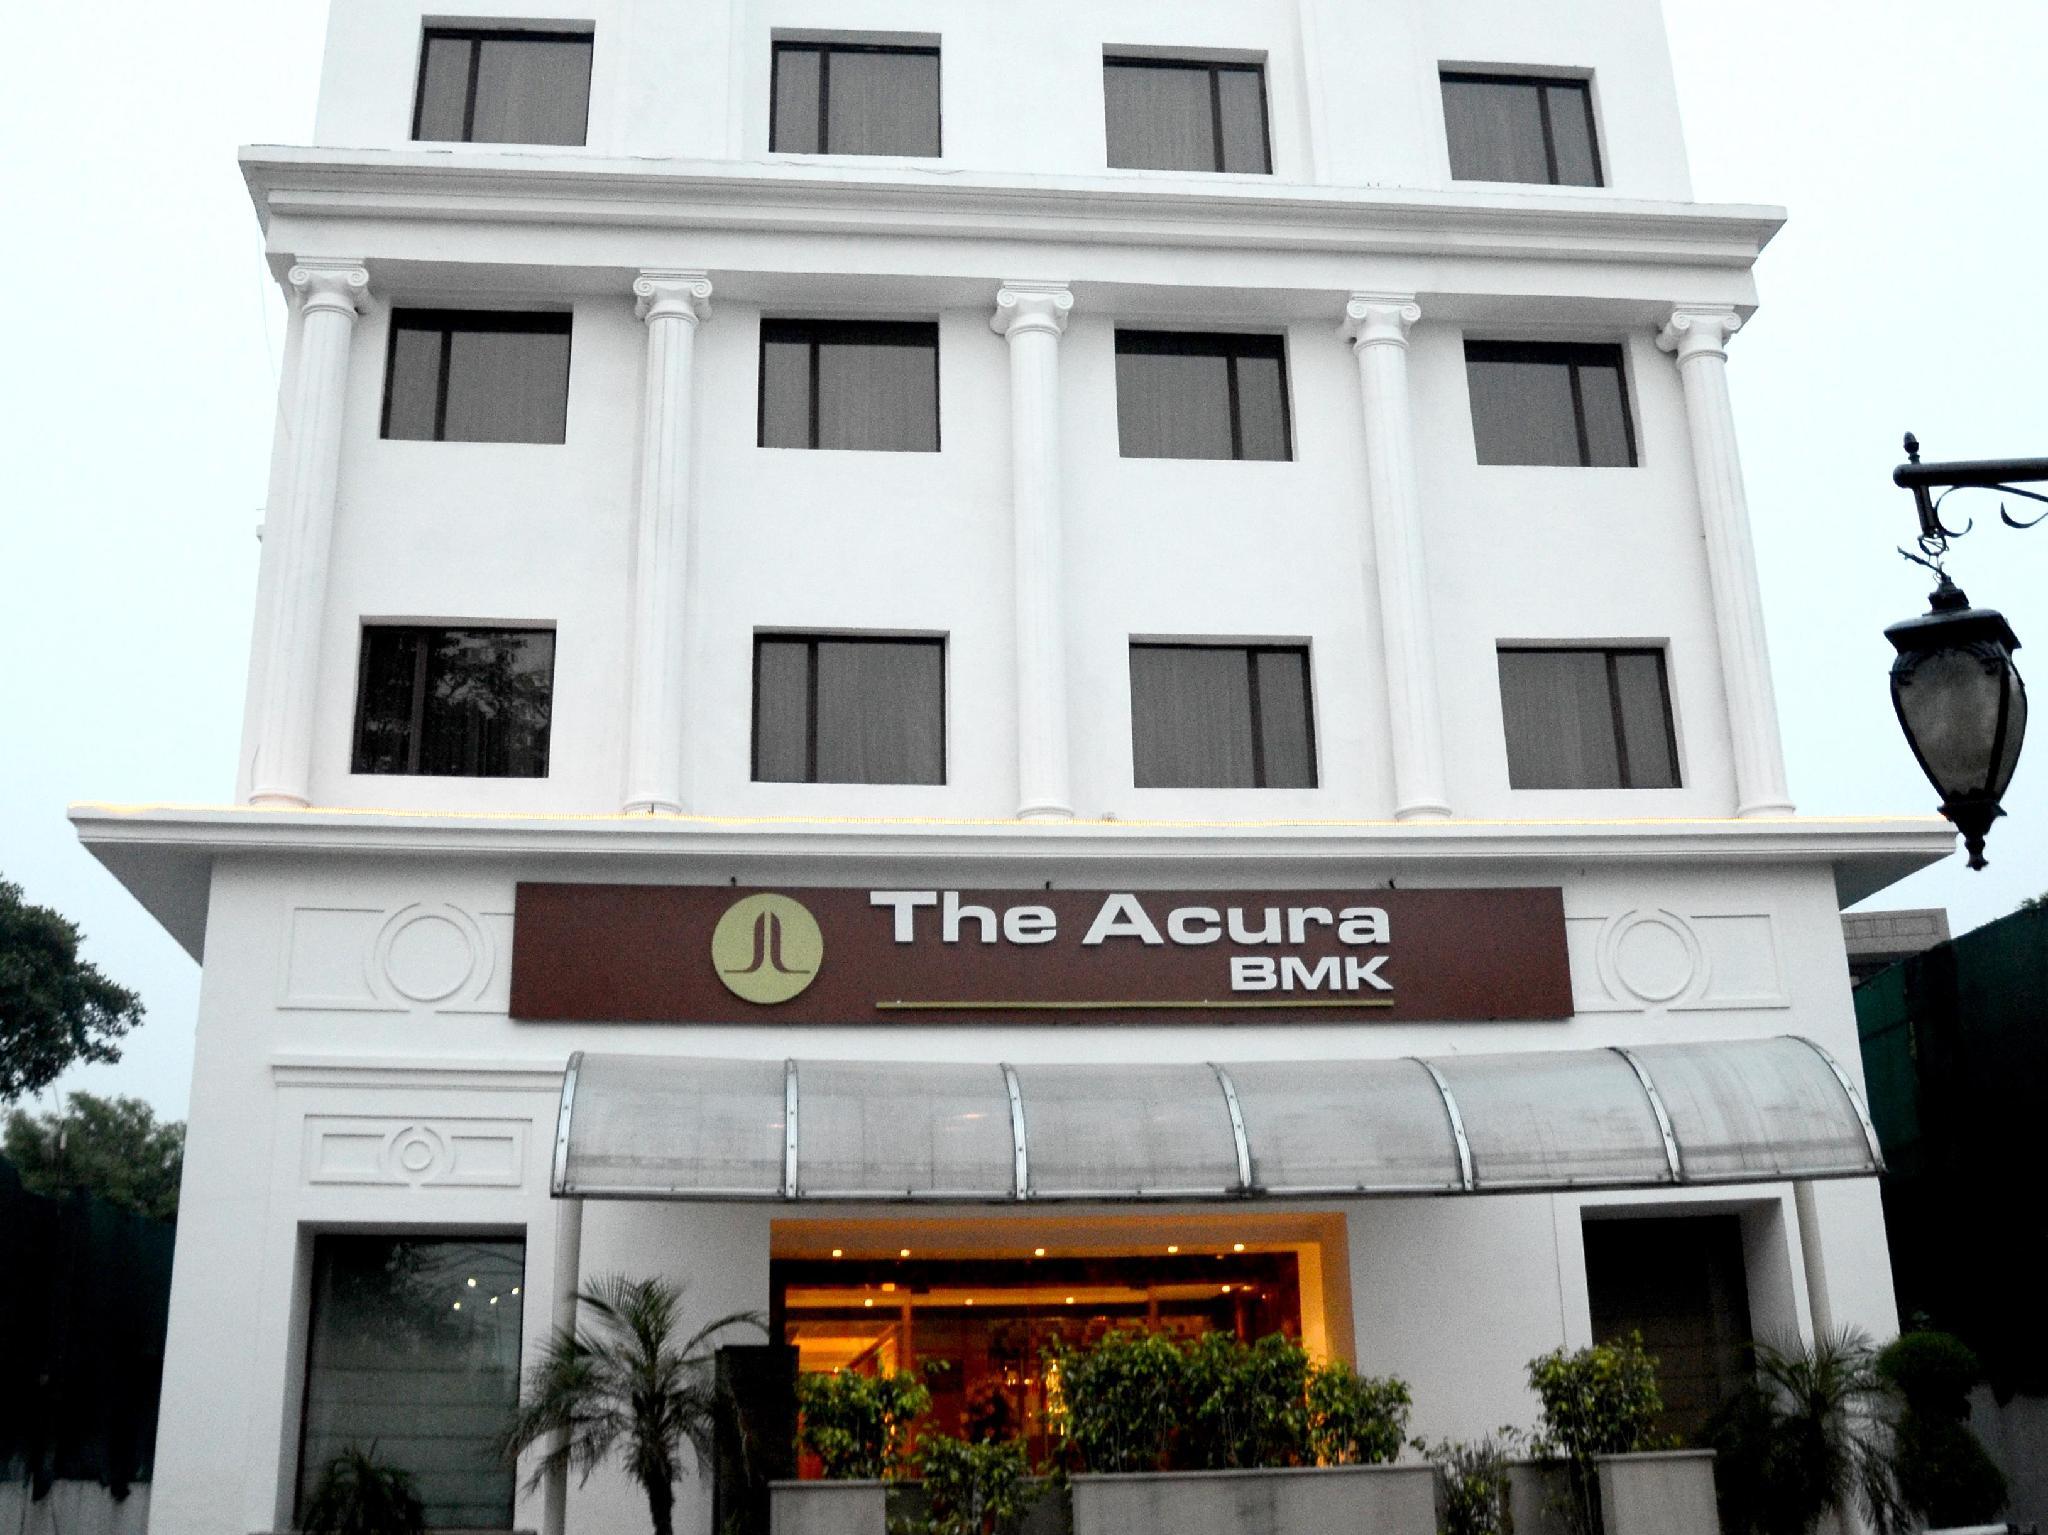 The Acura BMK